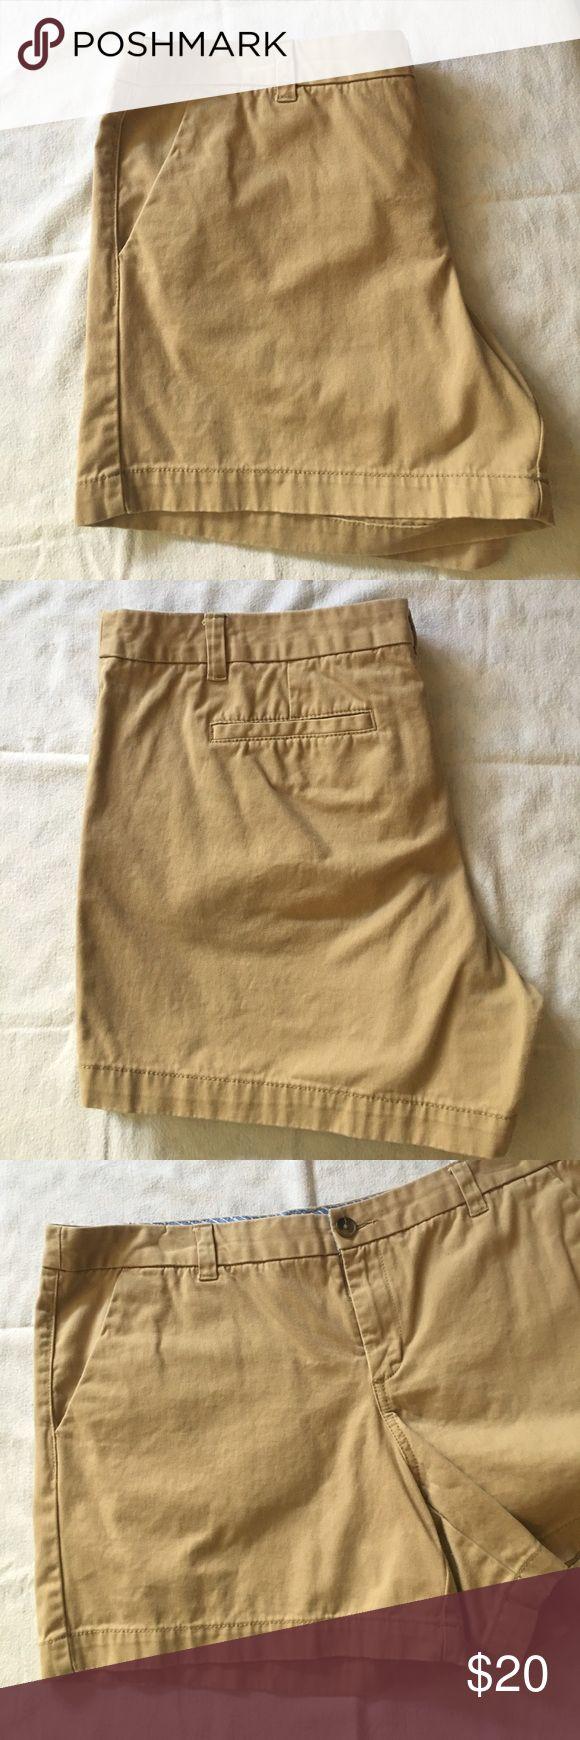 "Women's Khaki Shorts Women's Khaki Shorts 5"" Size 14 Merona Shorts"